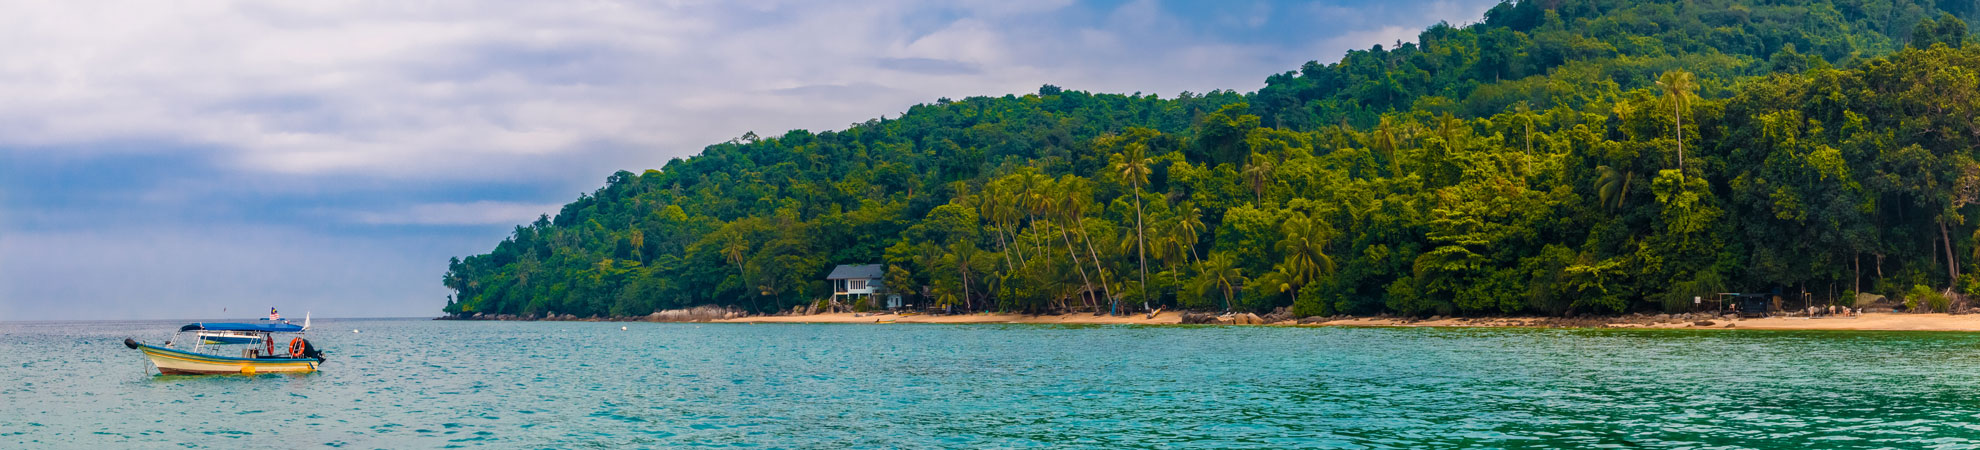 Vacances Malaisie